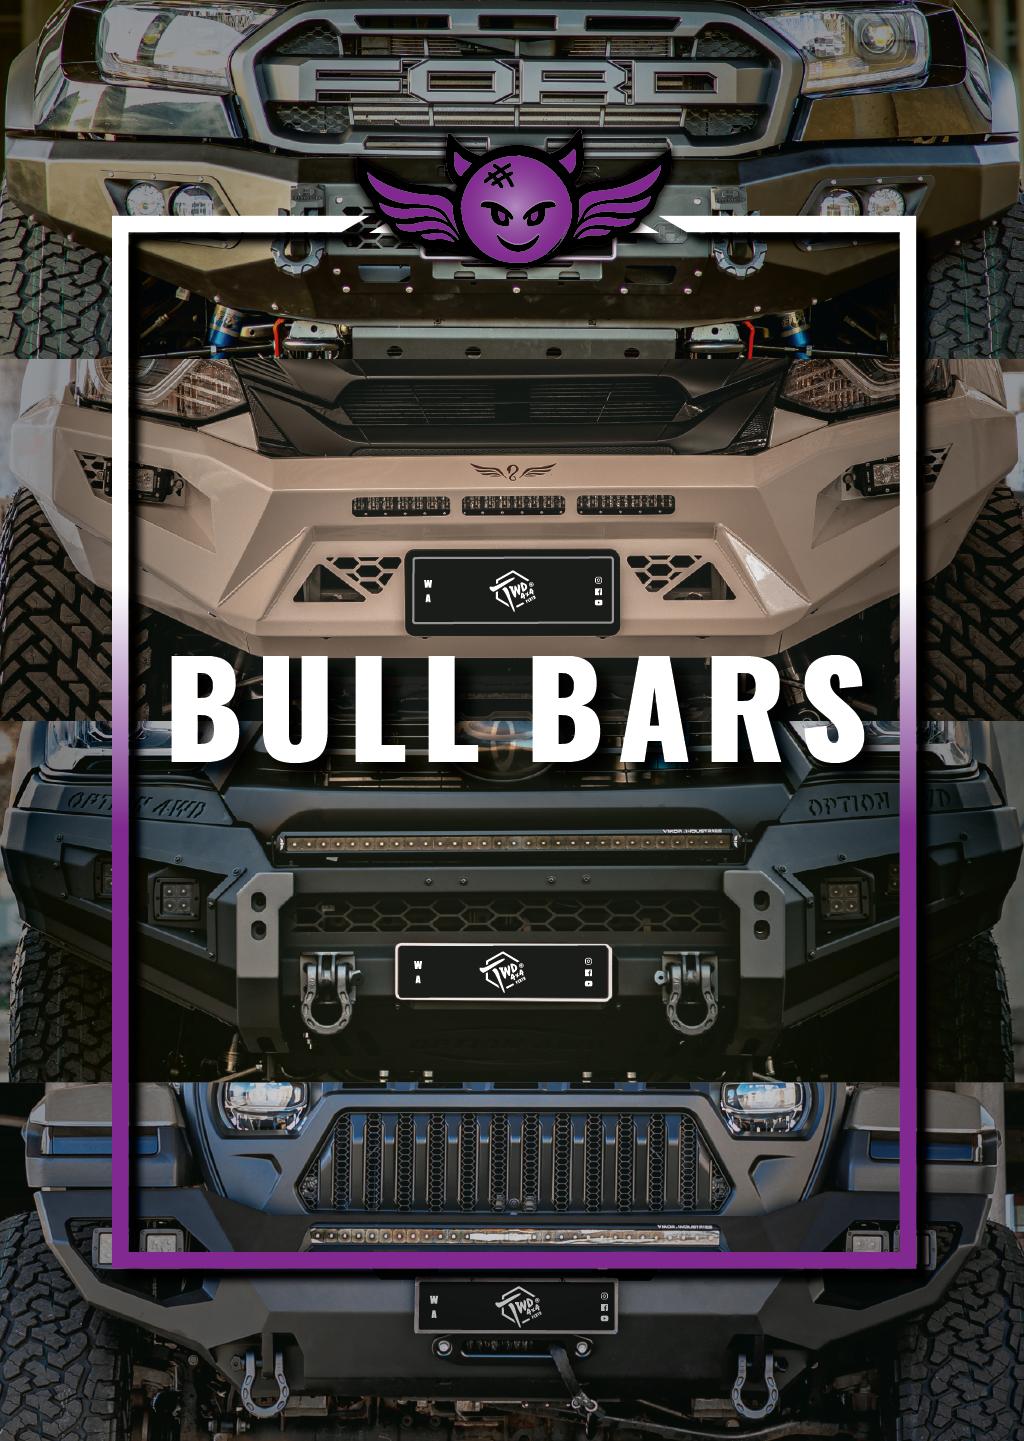 bull bars perth ford ranger bull bar perth twd 4x4 hamer bull bar 3